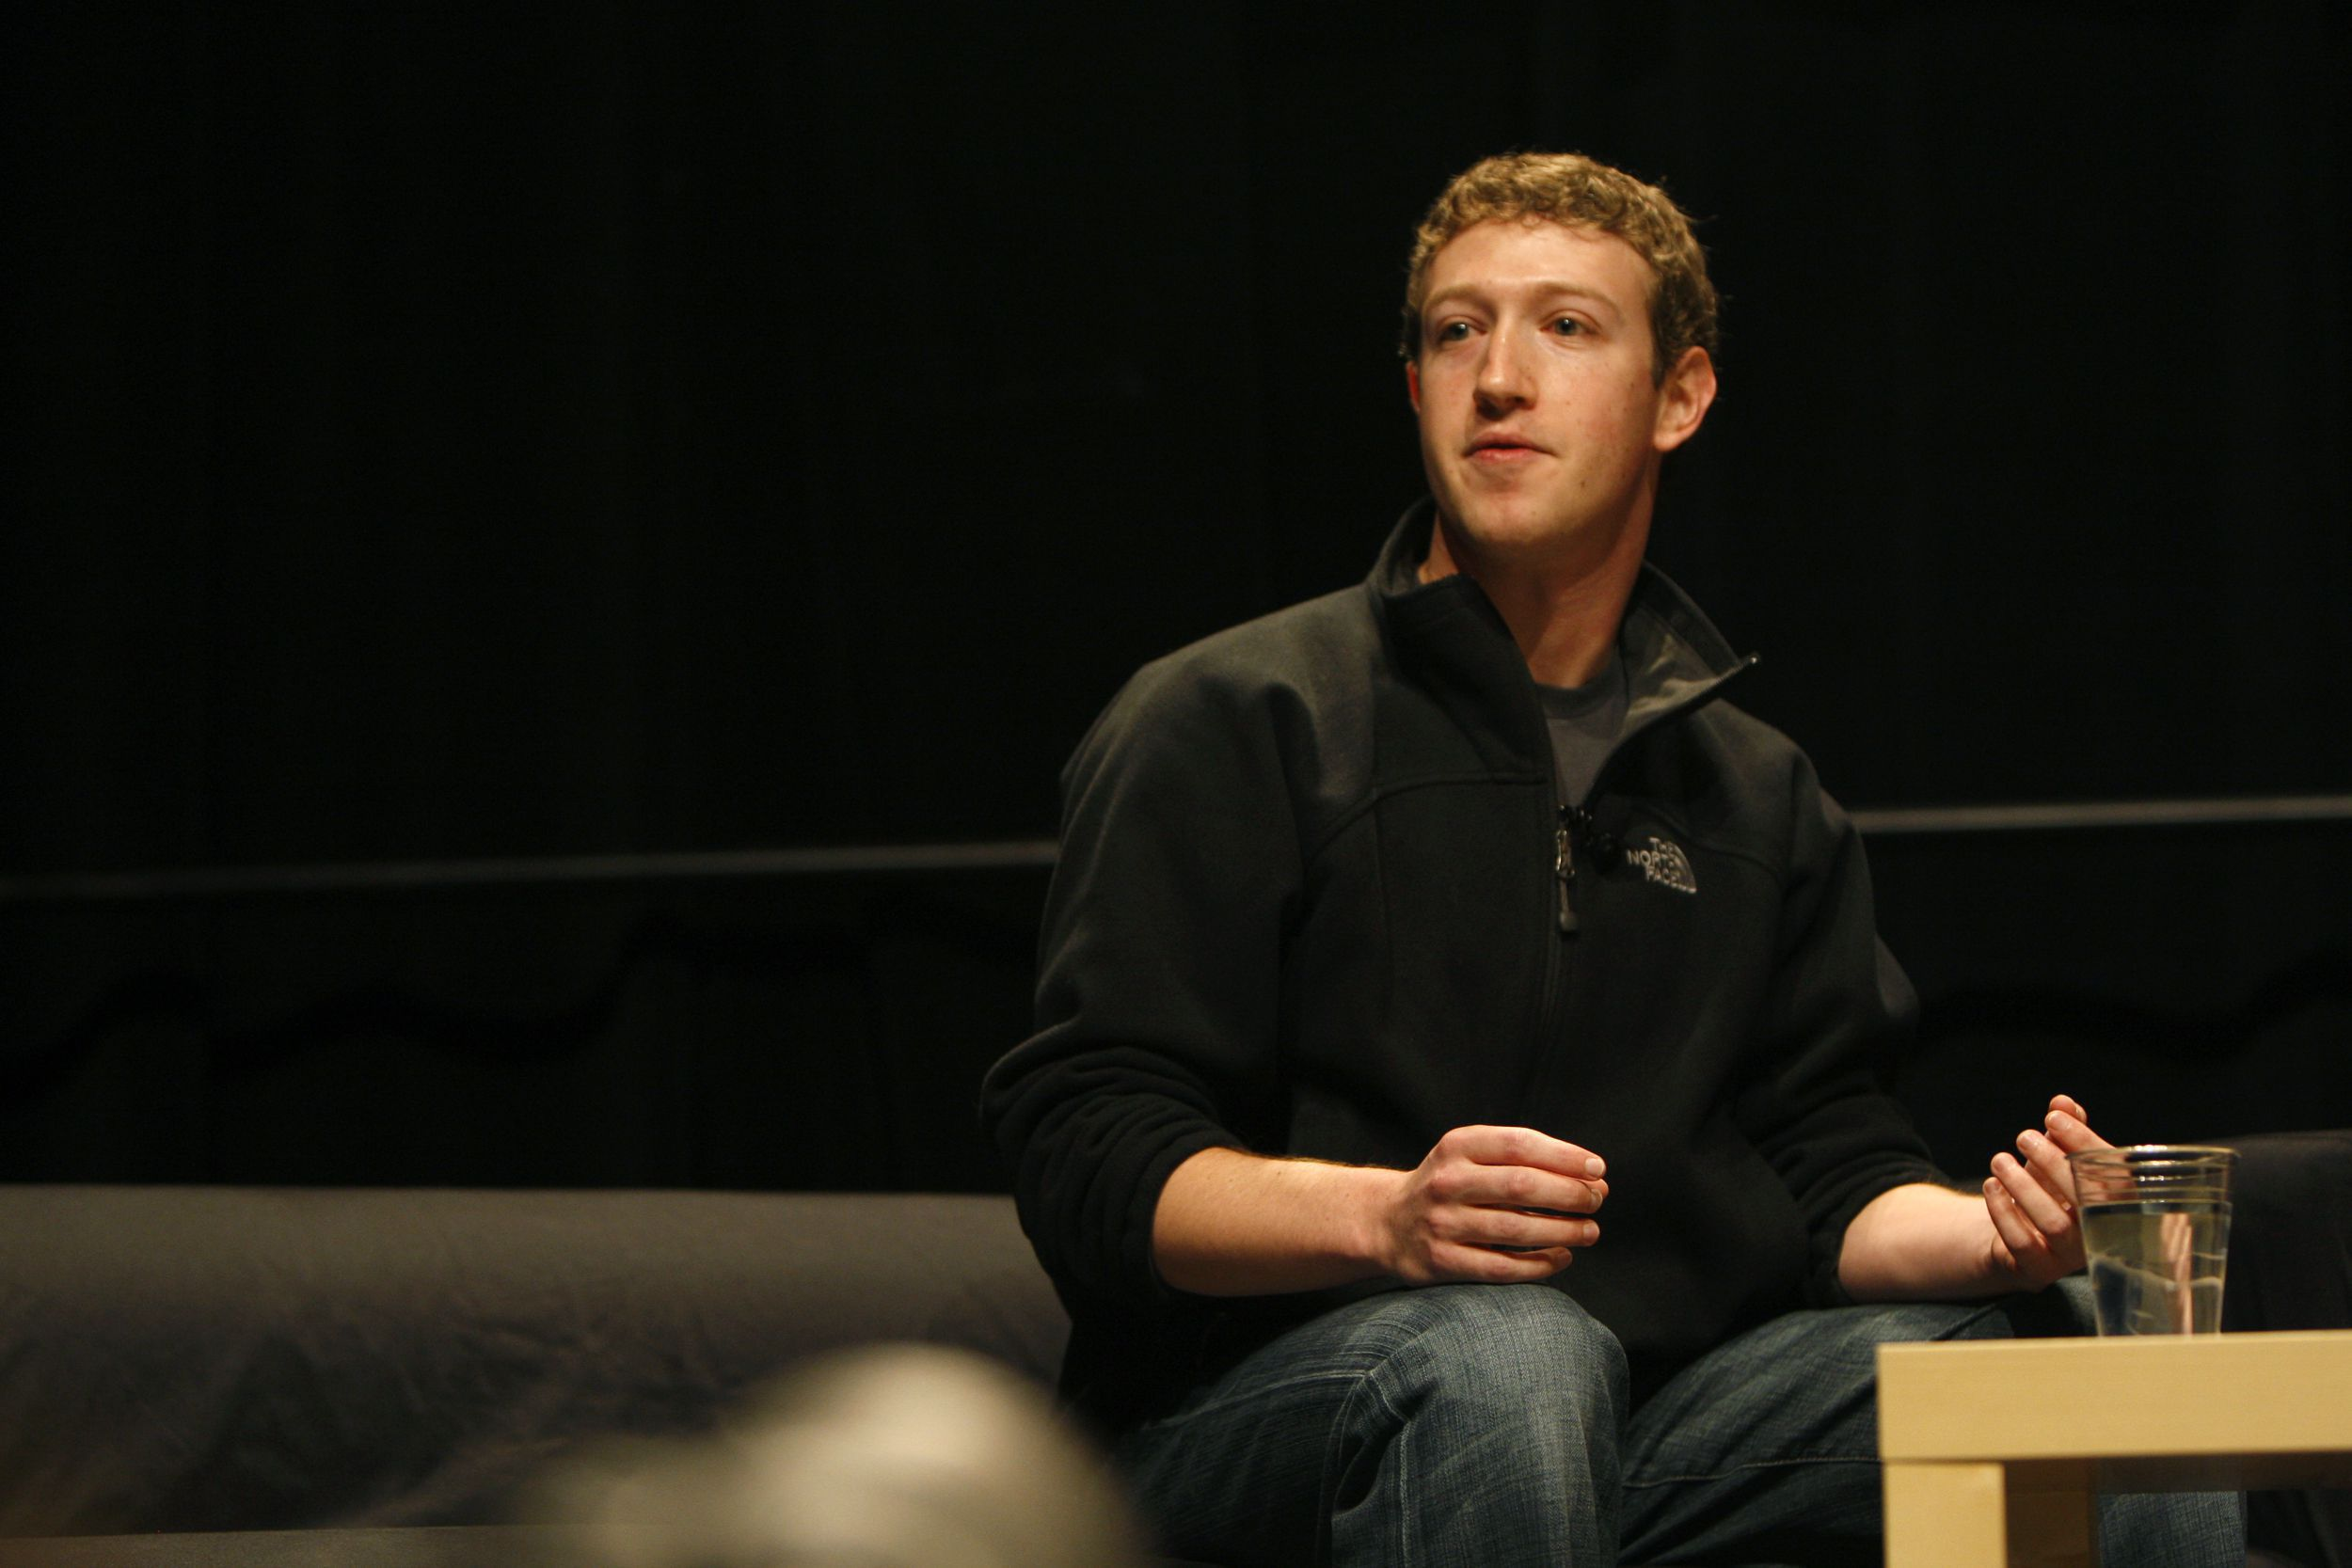 Mark Zuckerberg High Quality Wallpapers